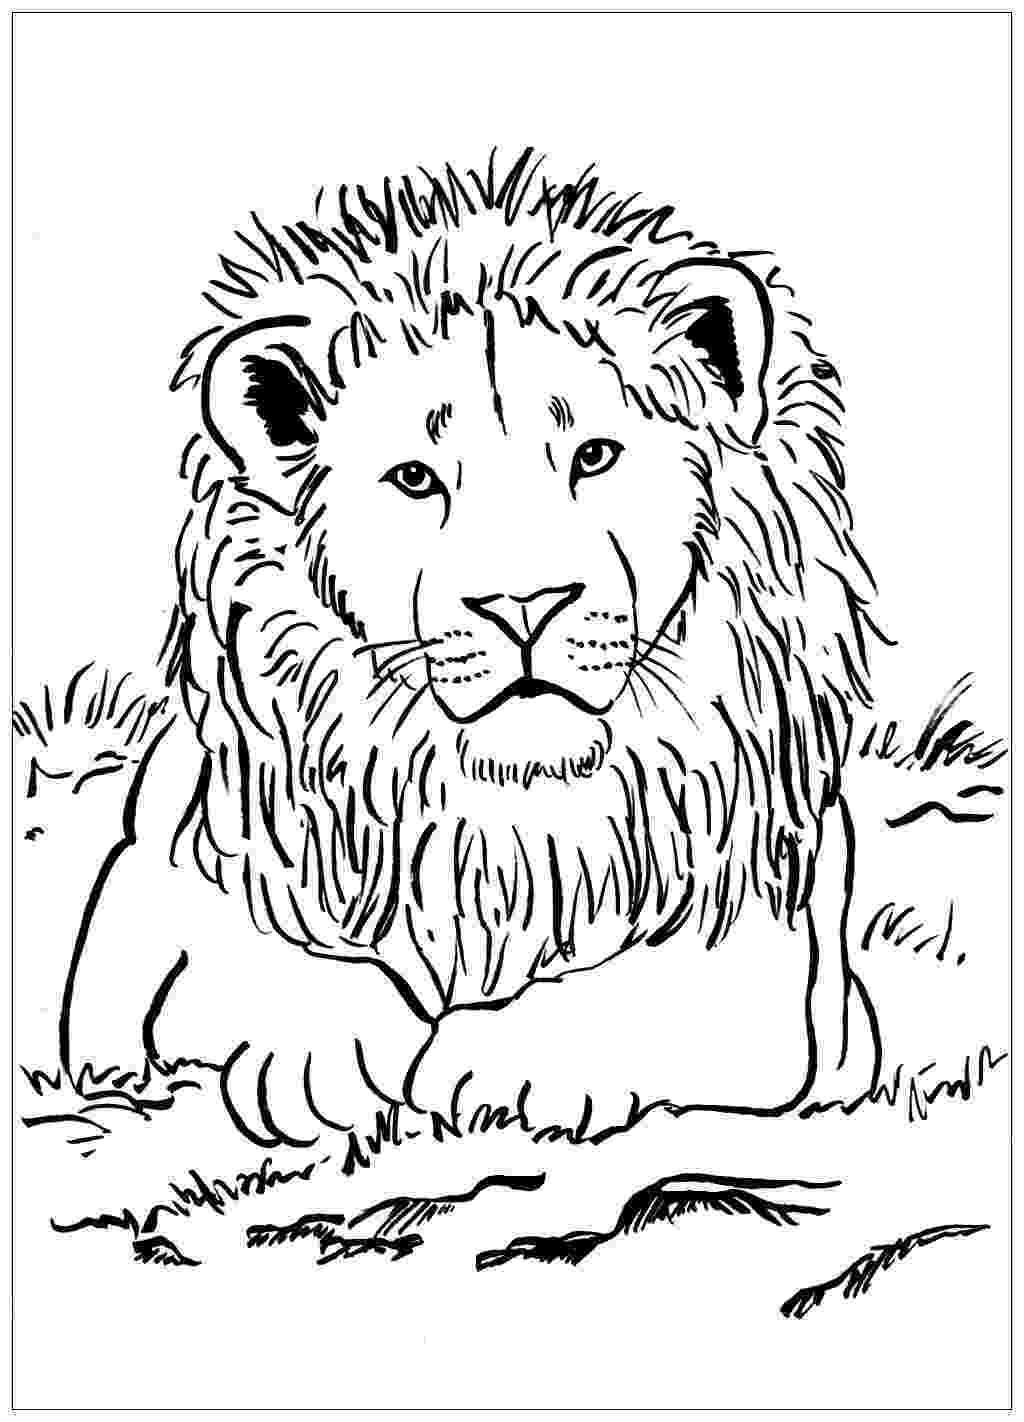 coloring lion lion king coloring pages best coloring pages for kids coloring lion 1 1